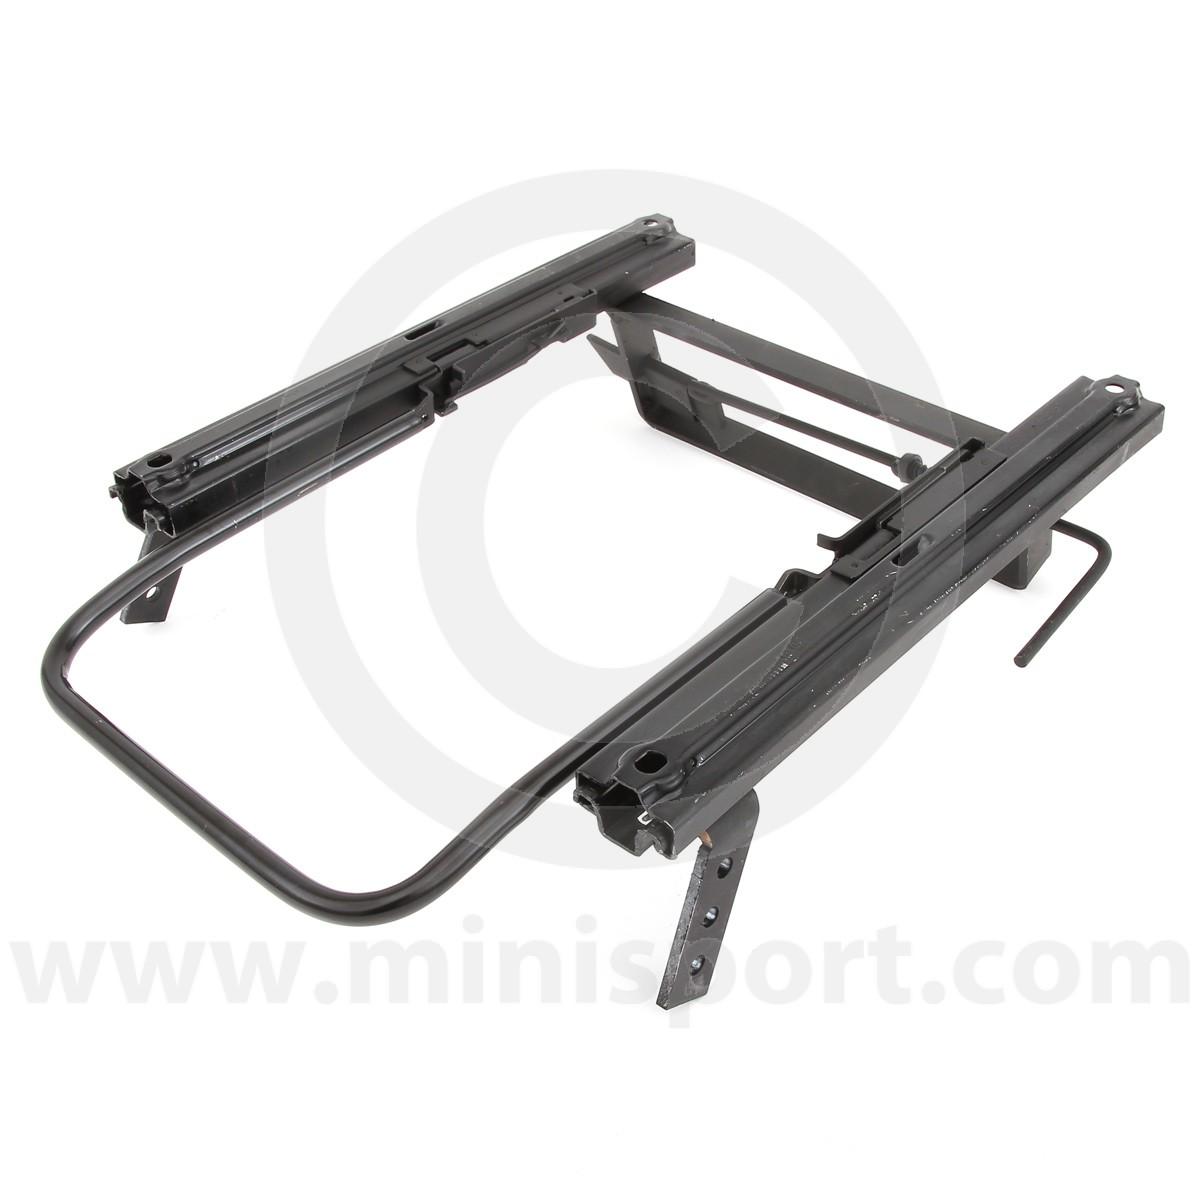 hight resolution of cobsubfr03l left side cobra seat frame locking type for classic mini models